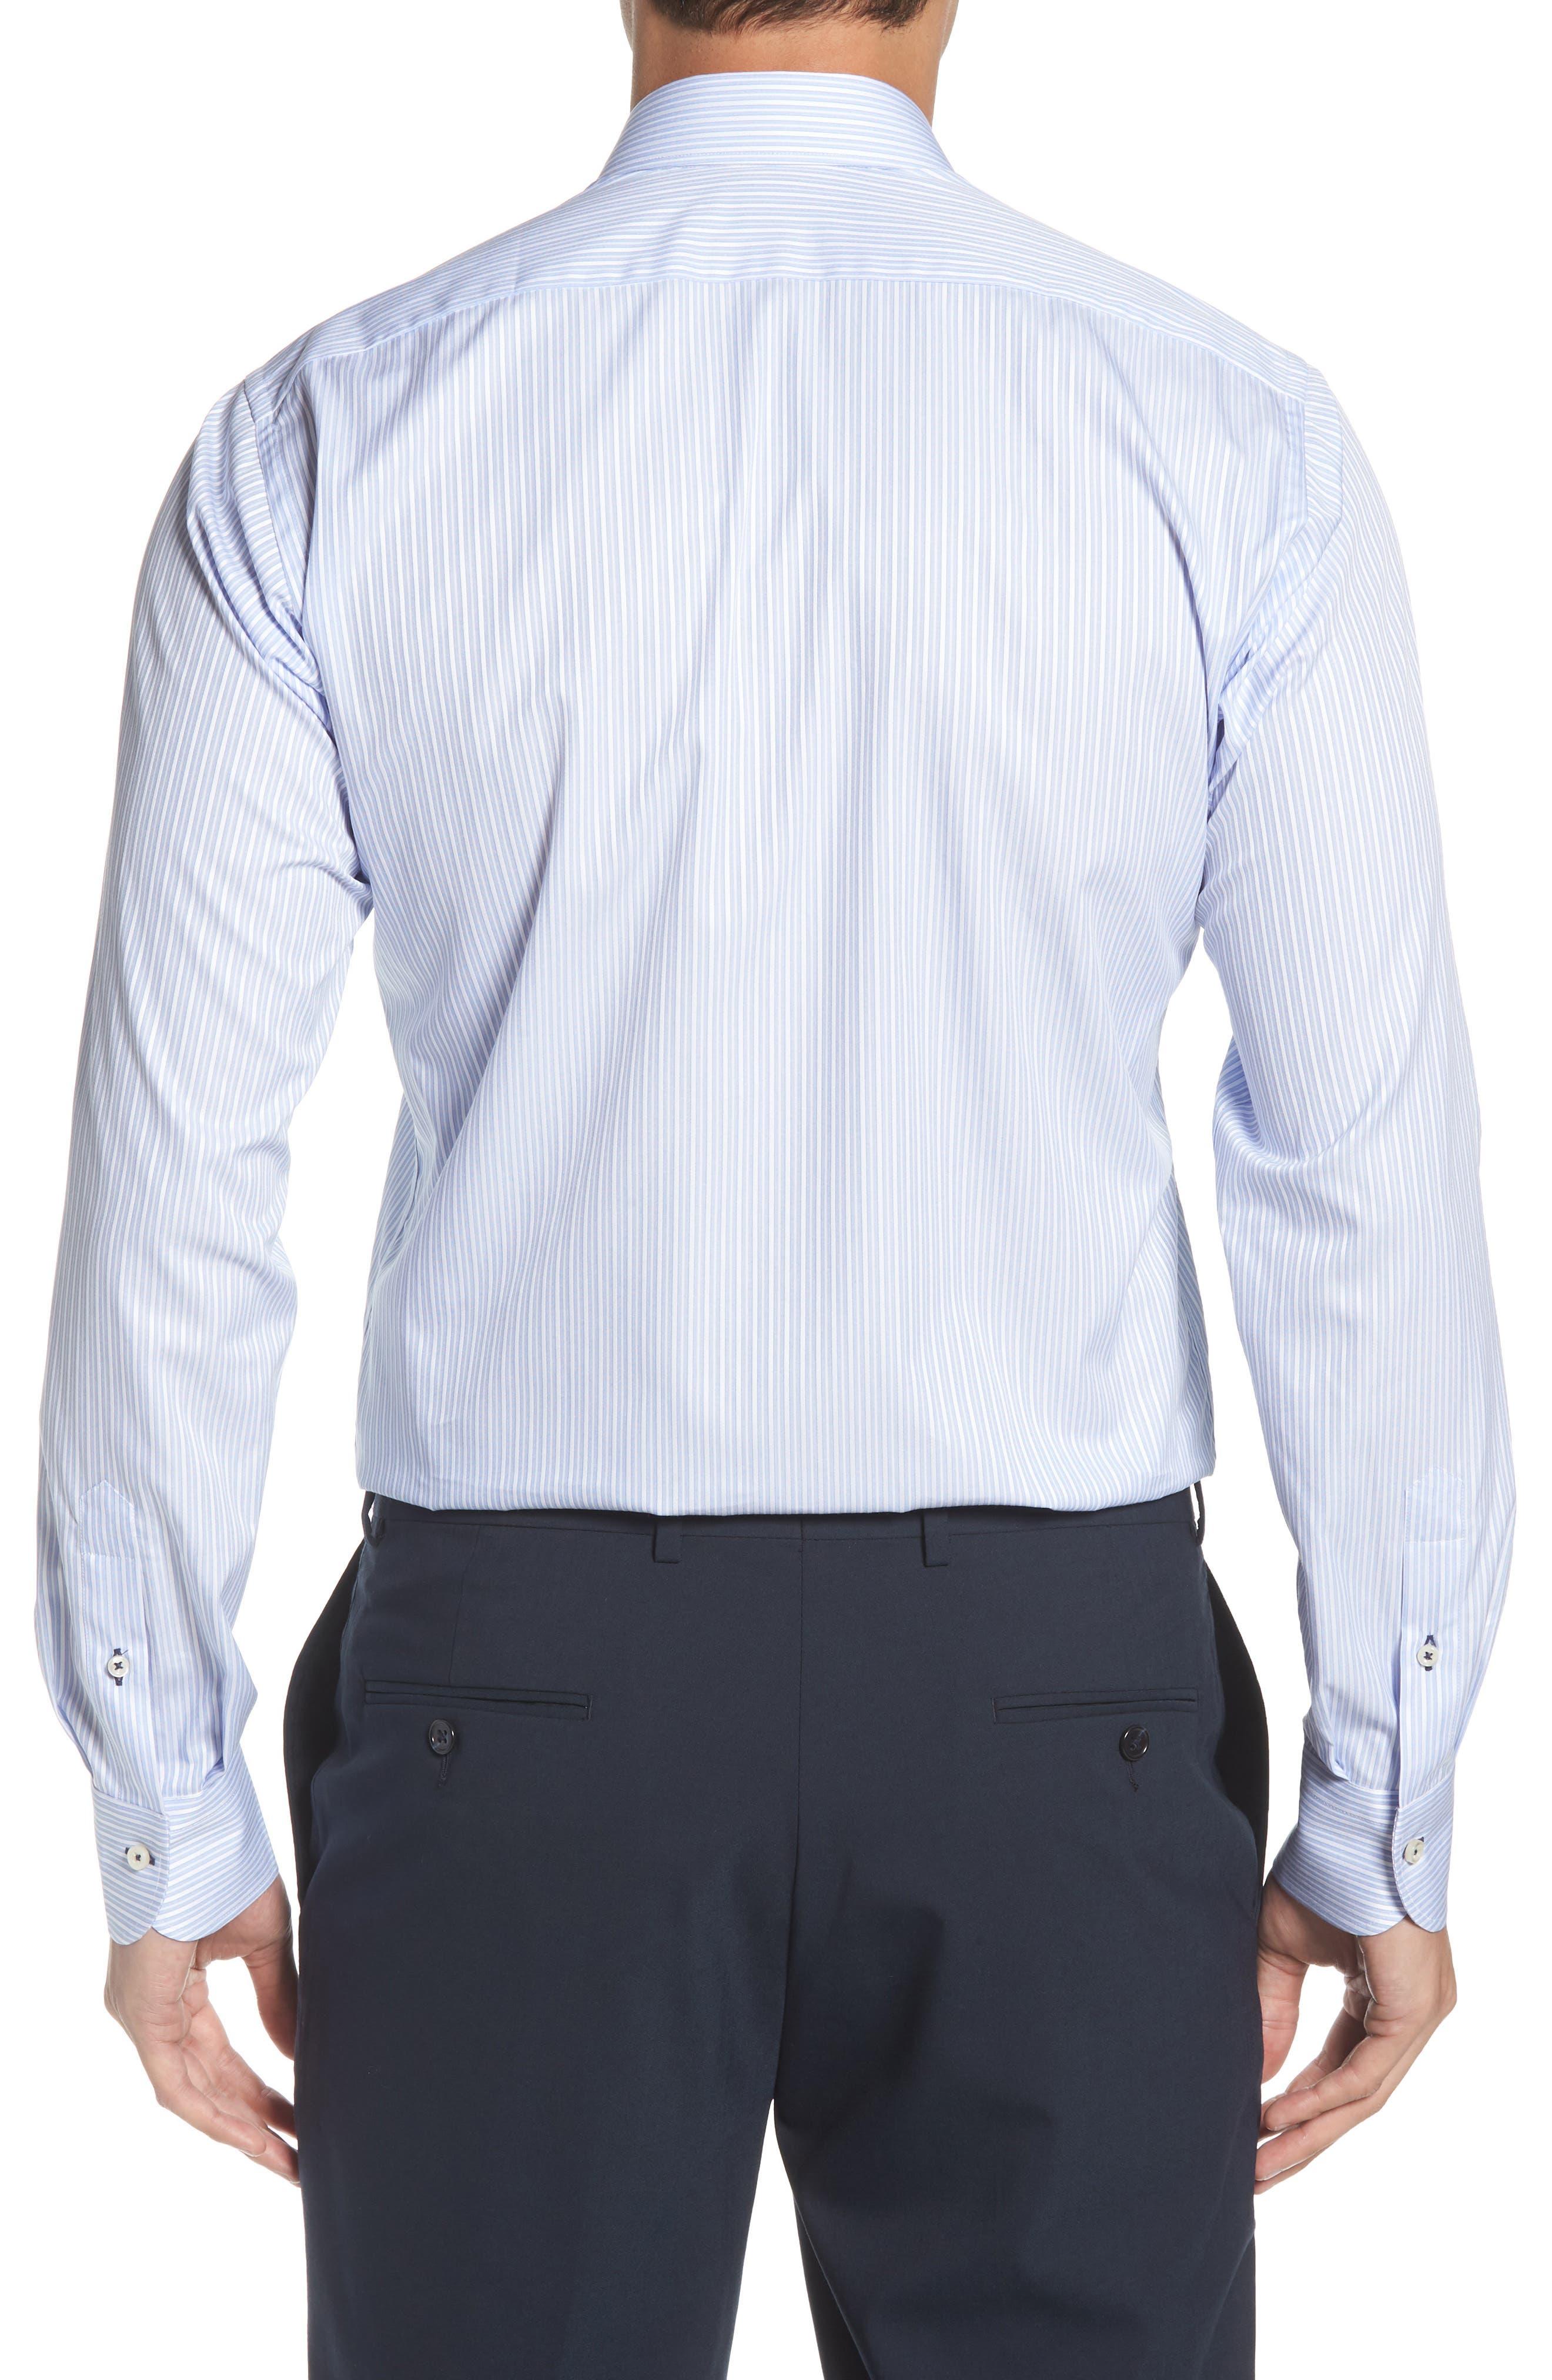 Regular Fit Stripe Dress Shirt,                             Alternate thumbnail 3, color,                             LIGHT BLUE